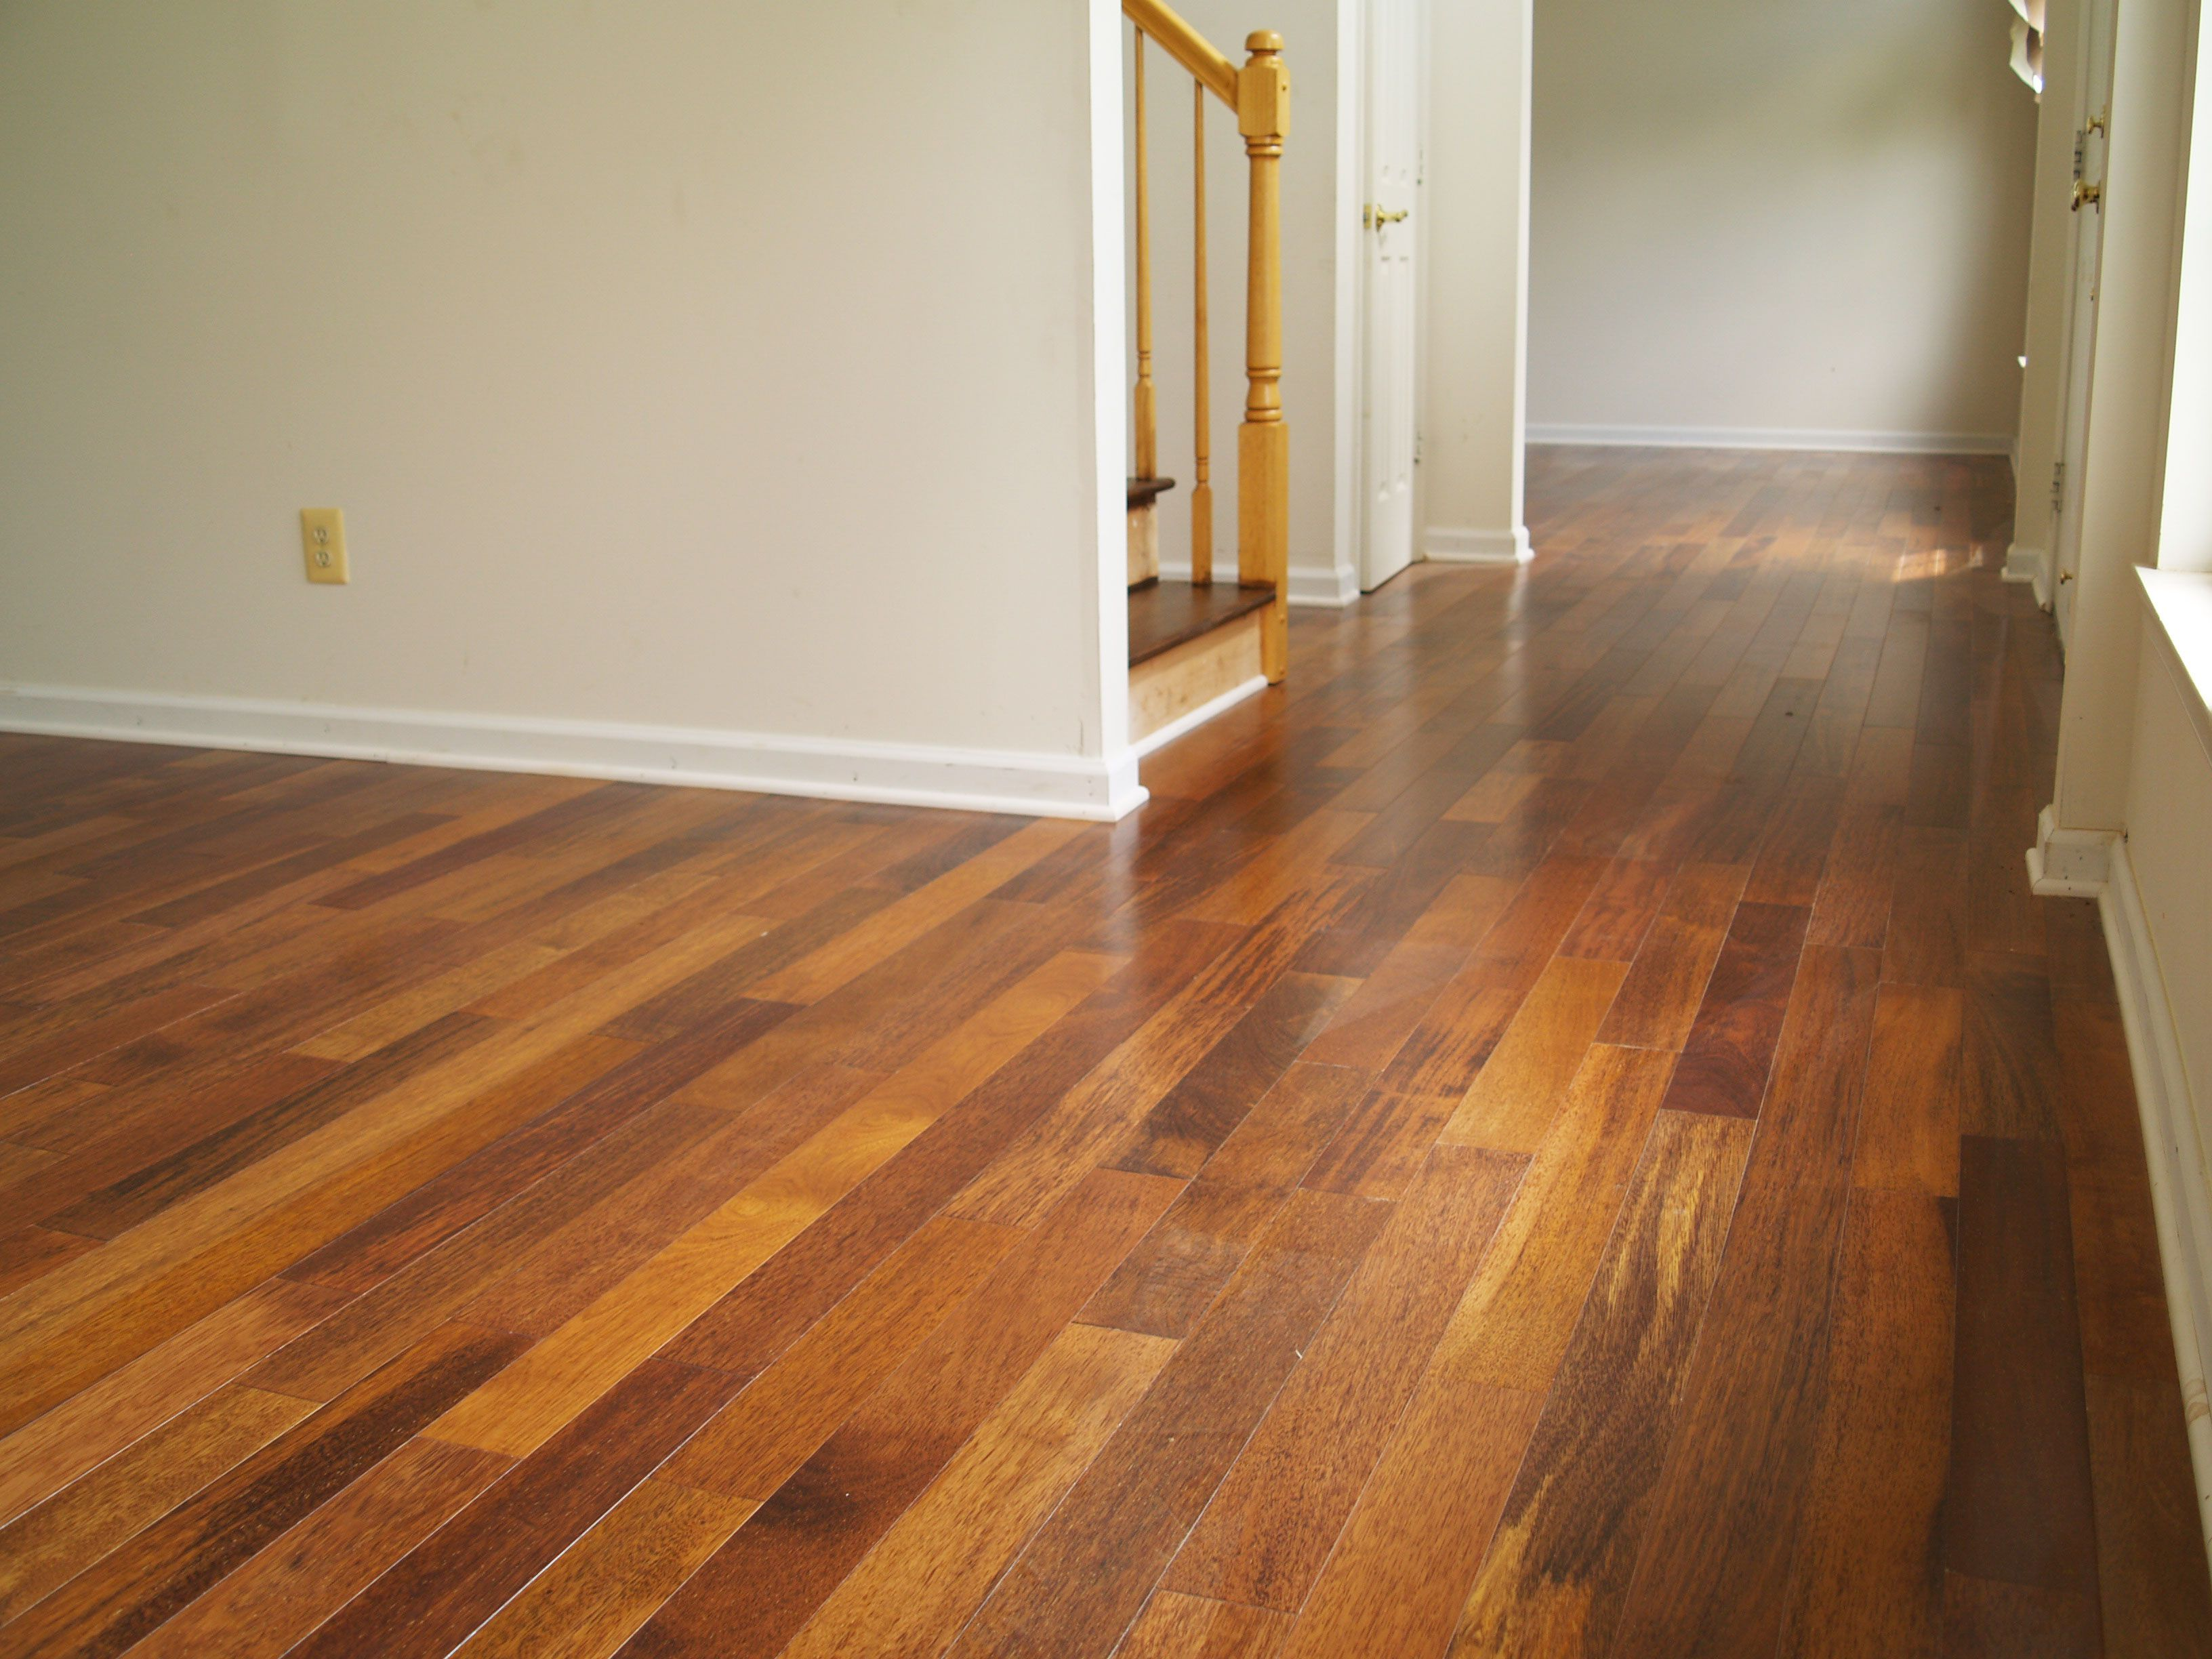 Merbau hardwood flooring. New Jersey